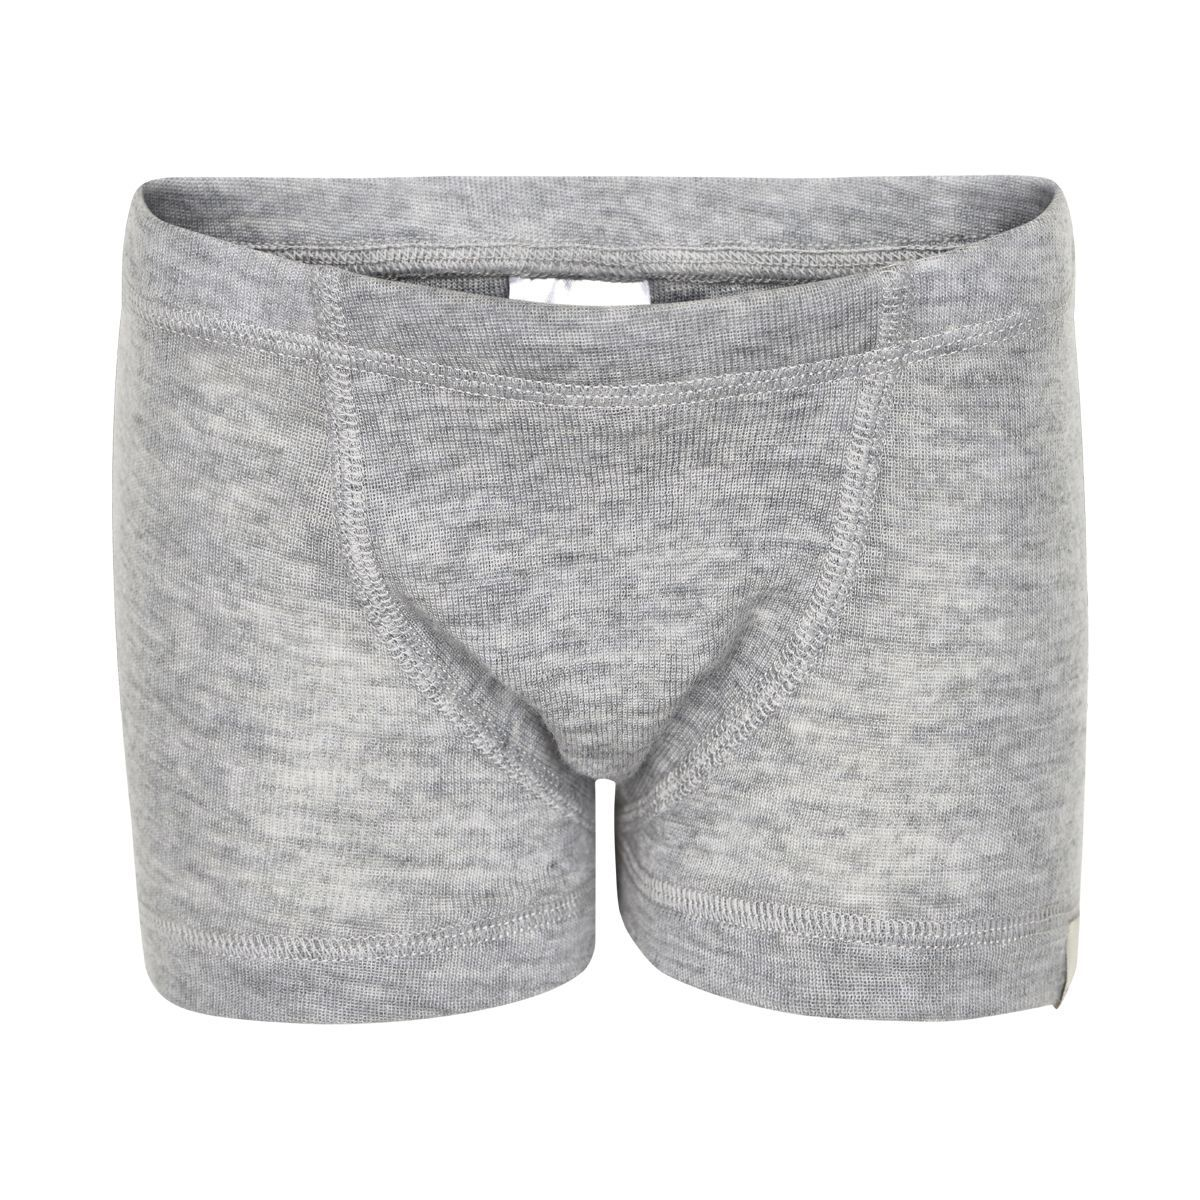 Boxershorts i uld fra CeLaVi - Grey melange thumbnail